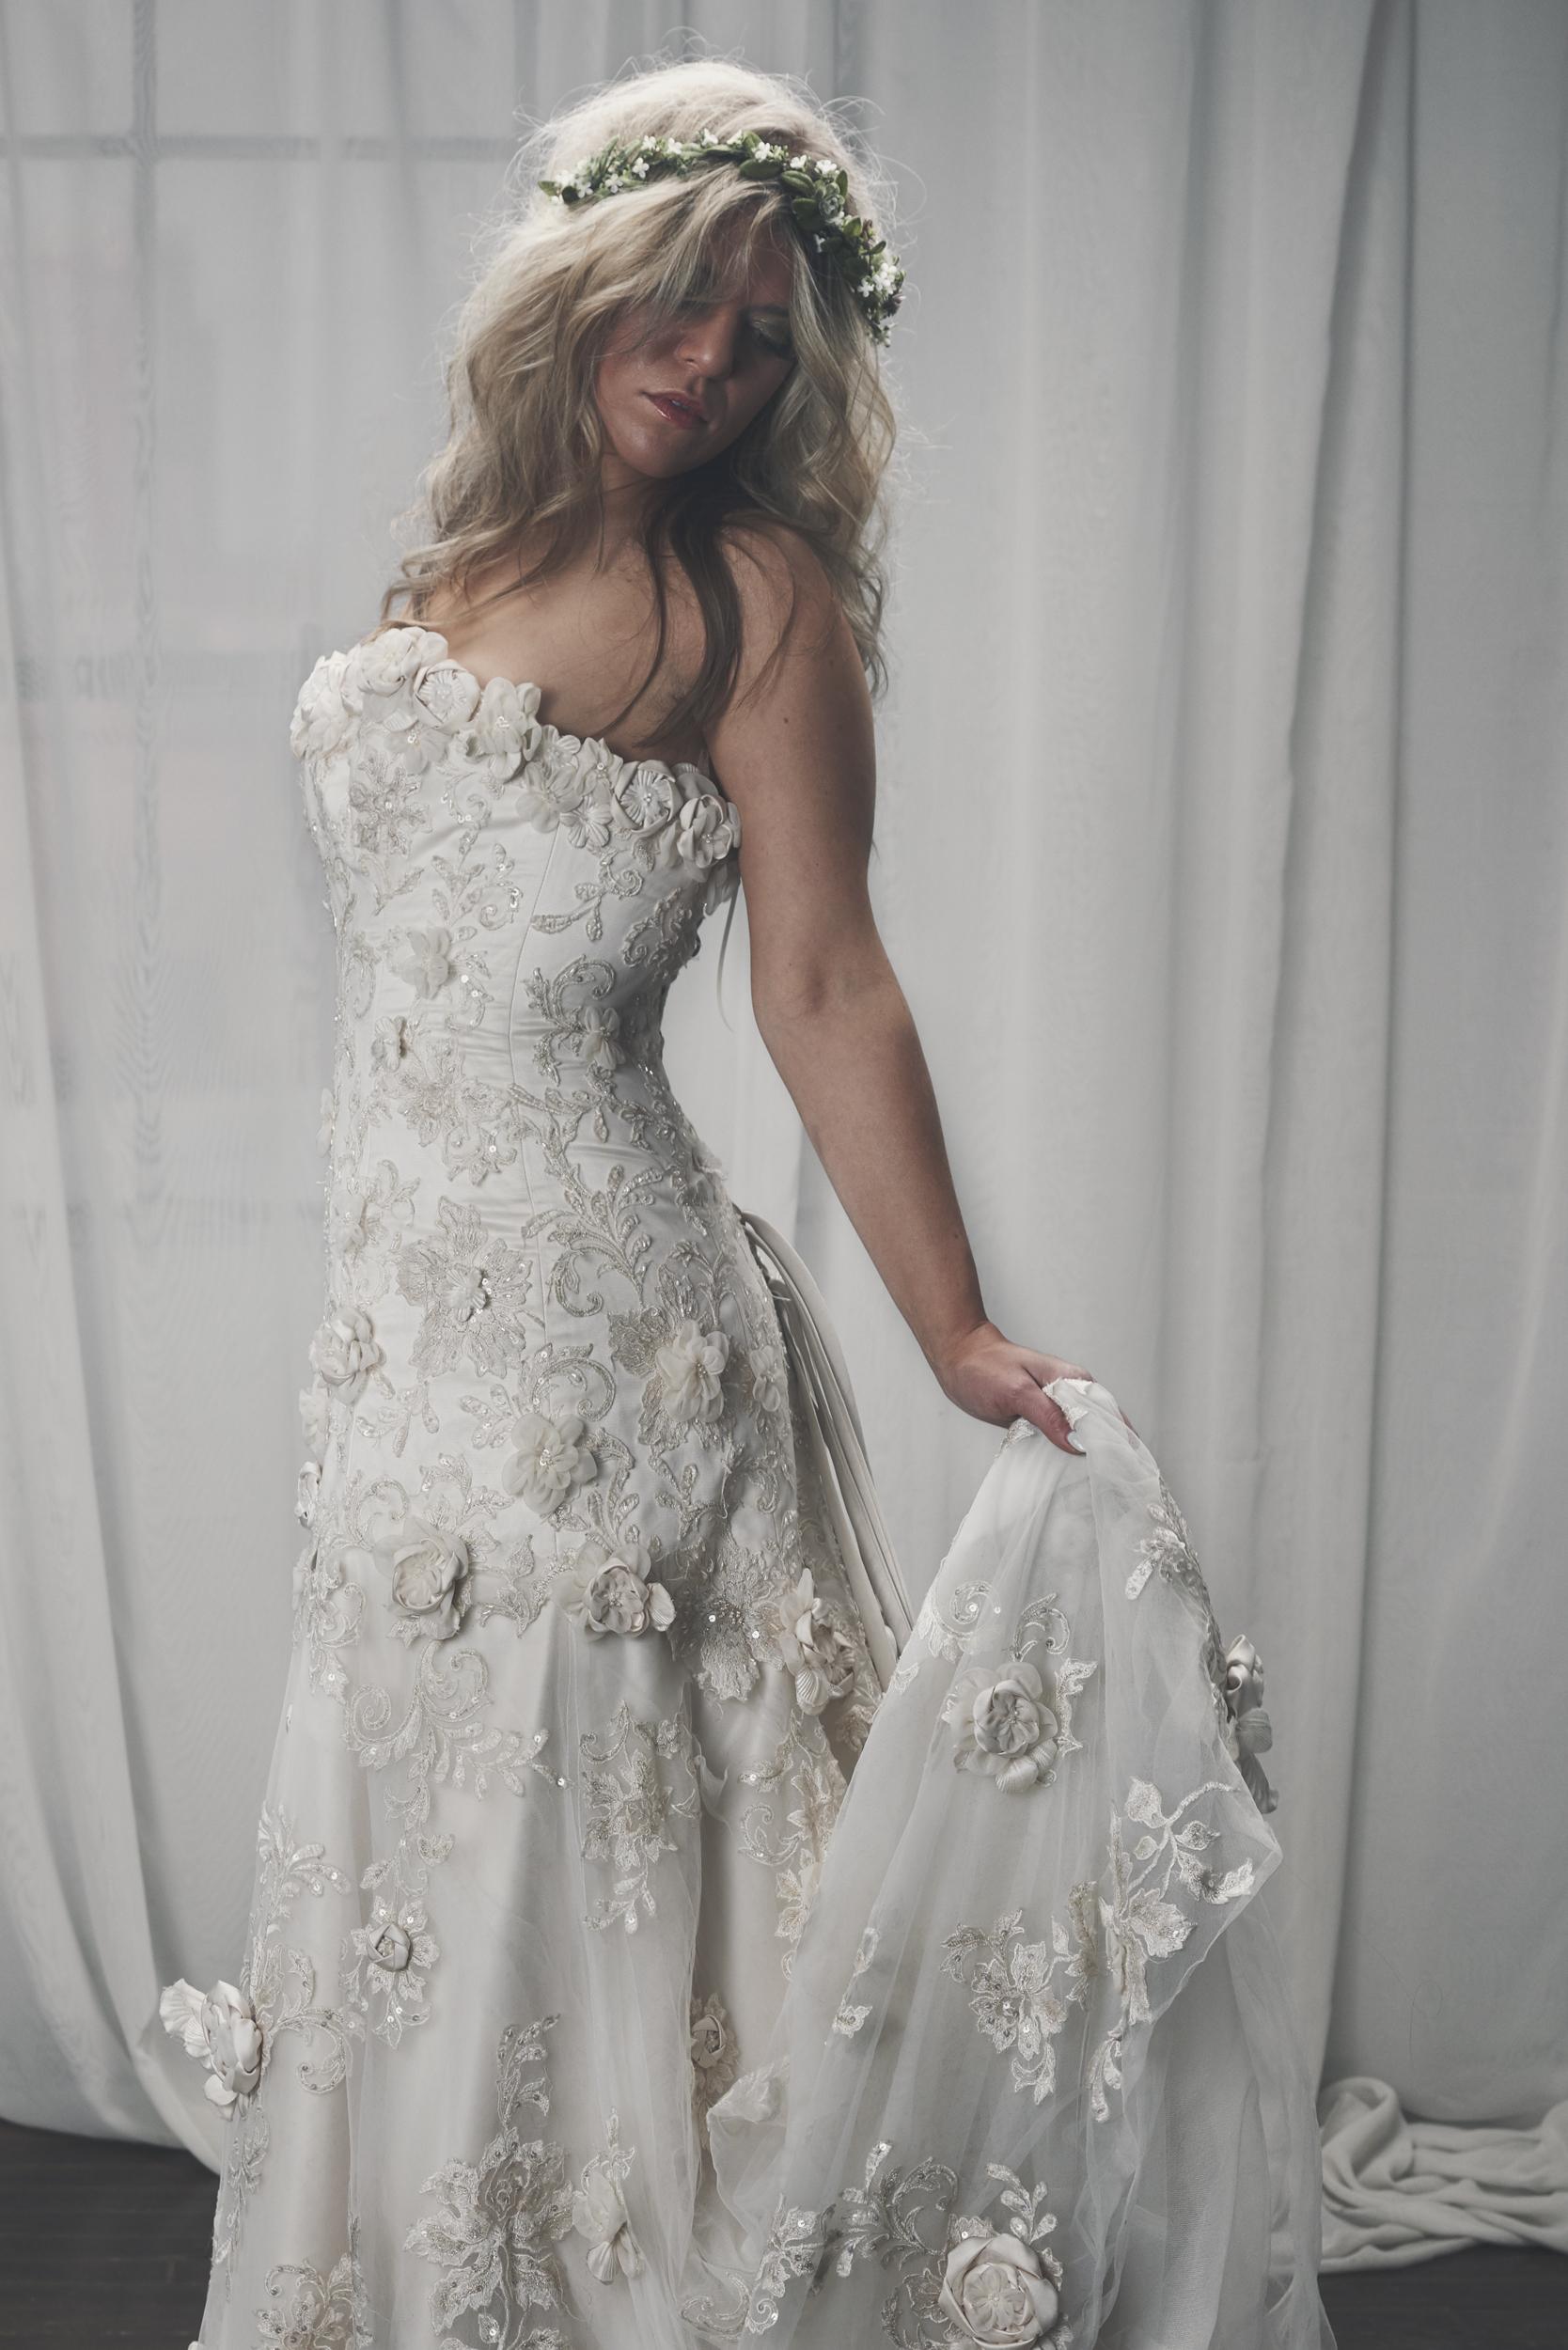 Bridal Portrait Session New Hampshire